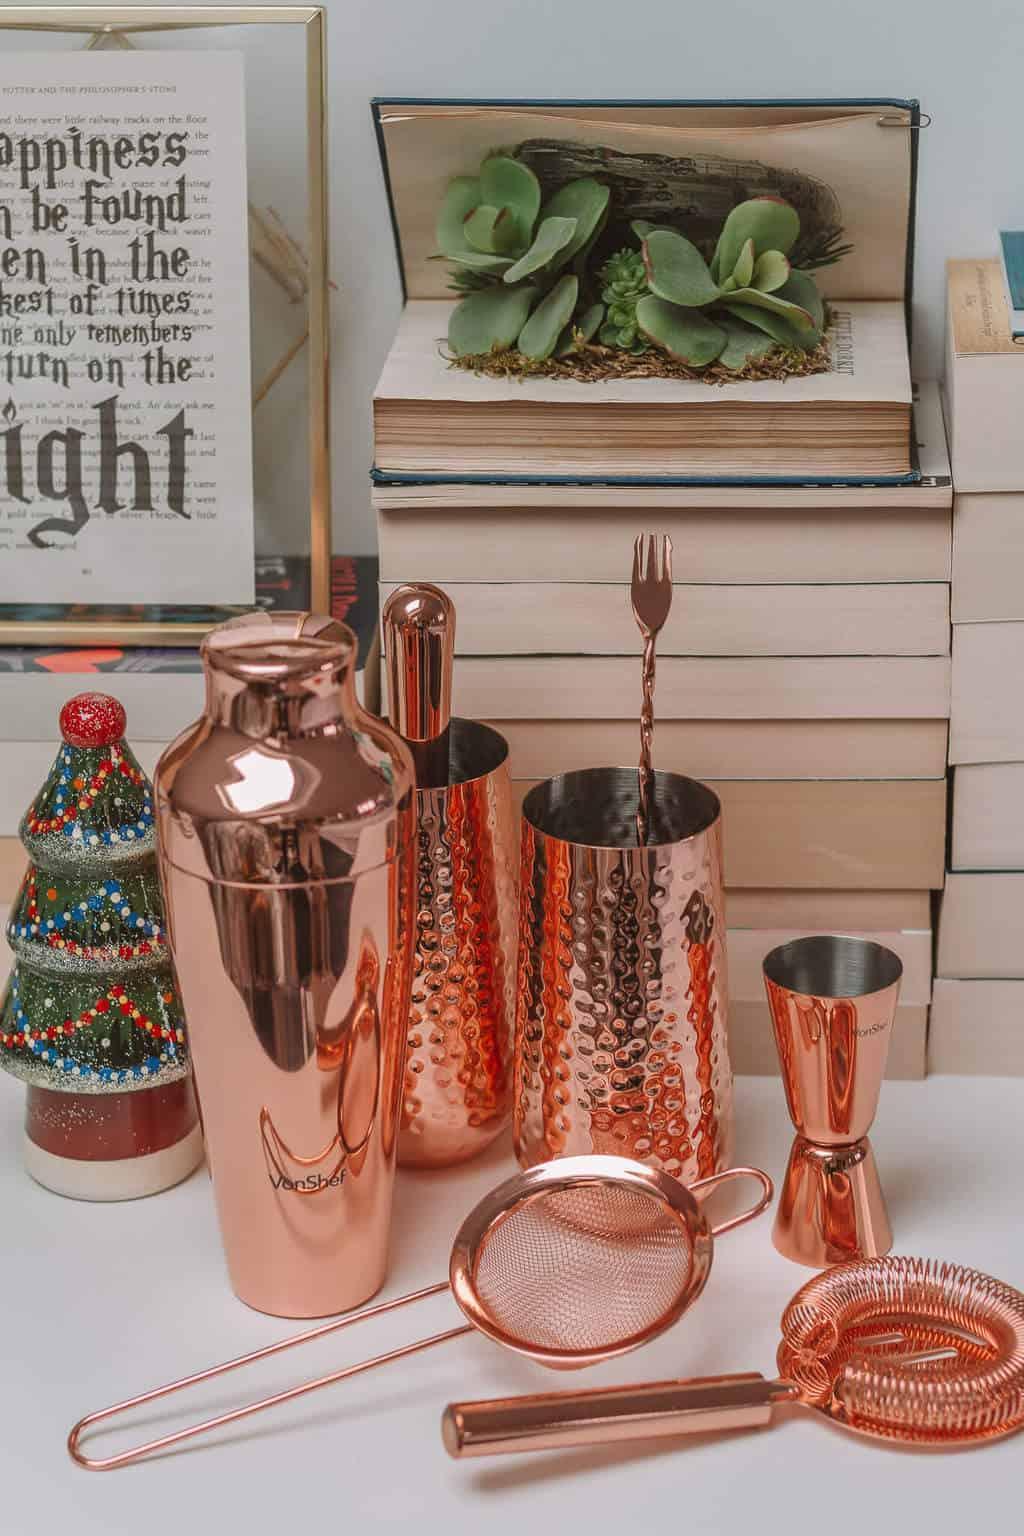 Cocktail Set - Christmas Gift Guide 2018: Brilliant Christmas Gift Ideas For Her #whatshotblog